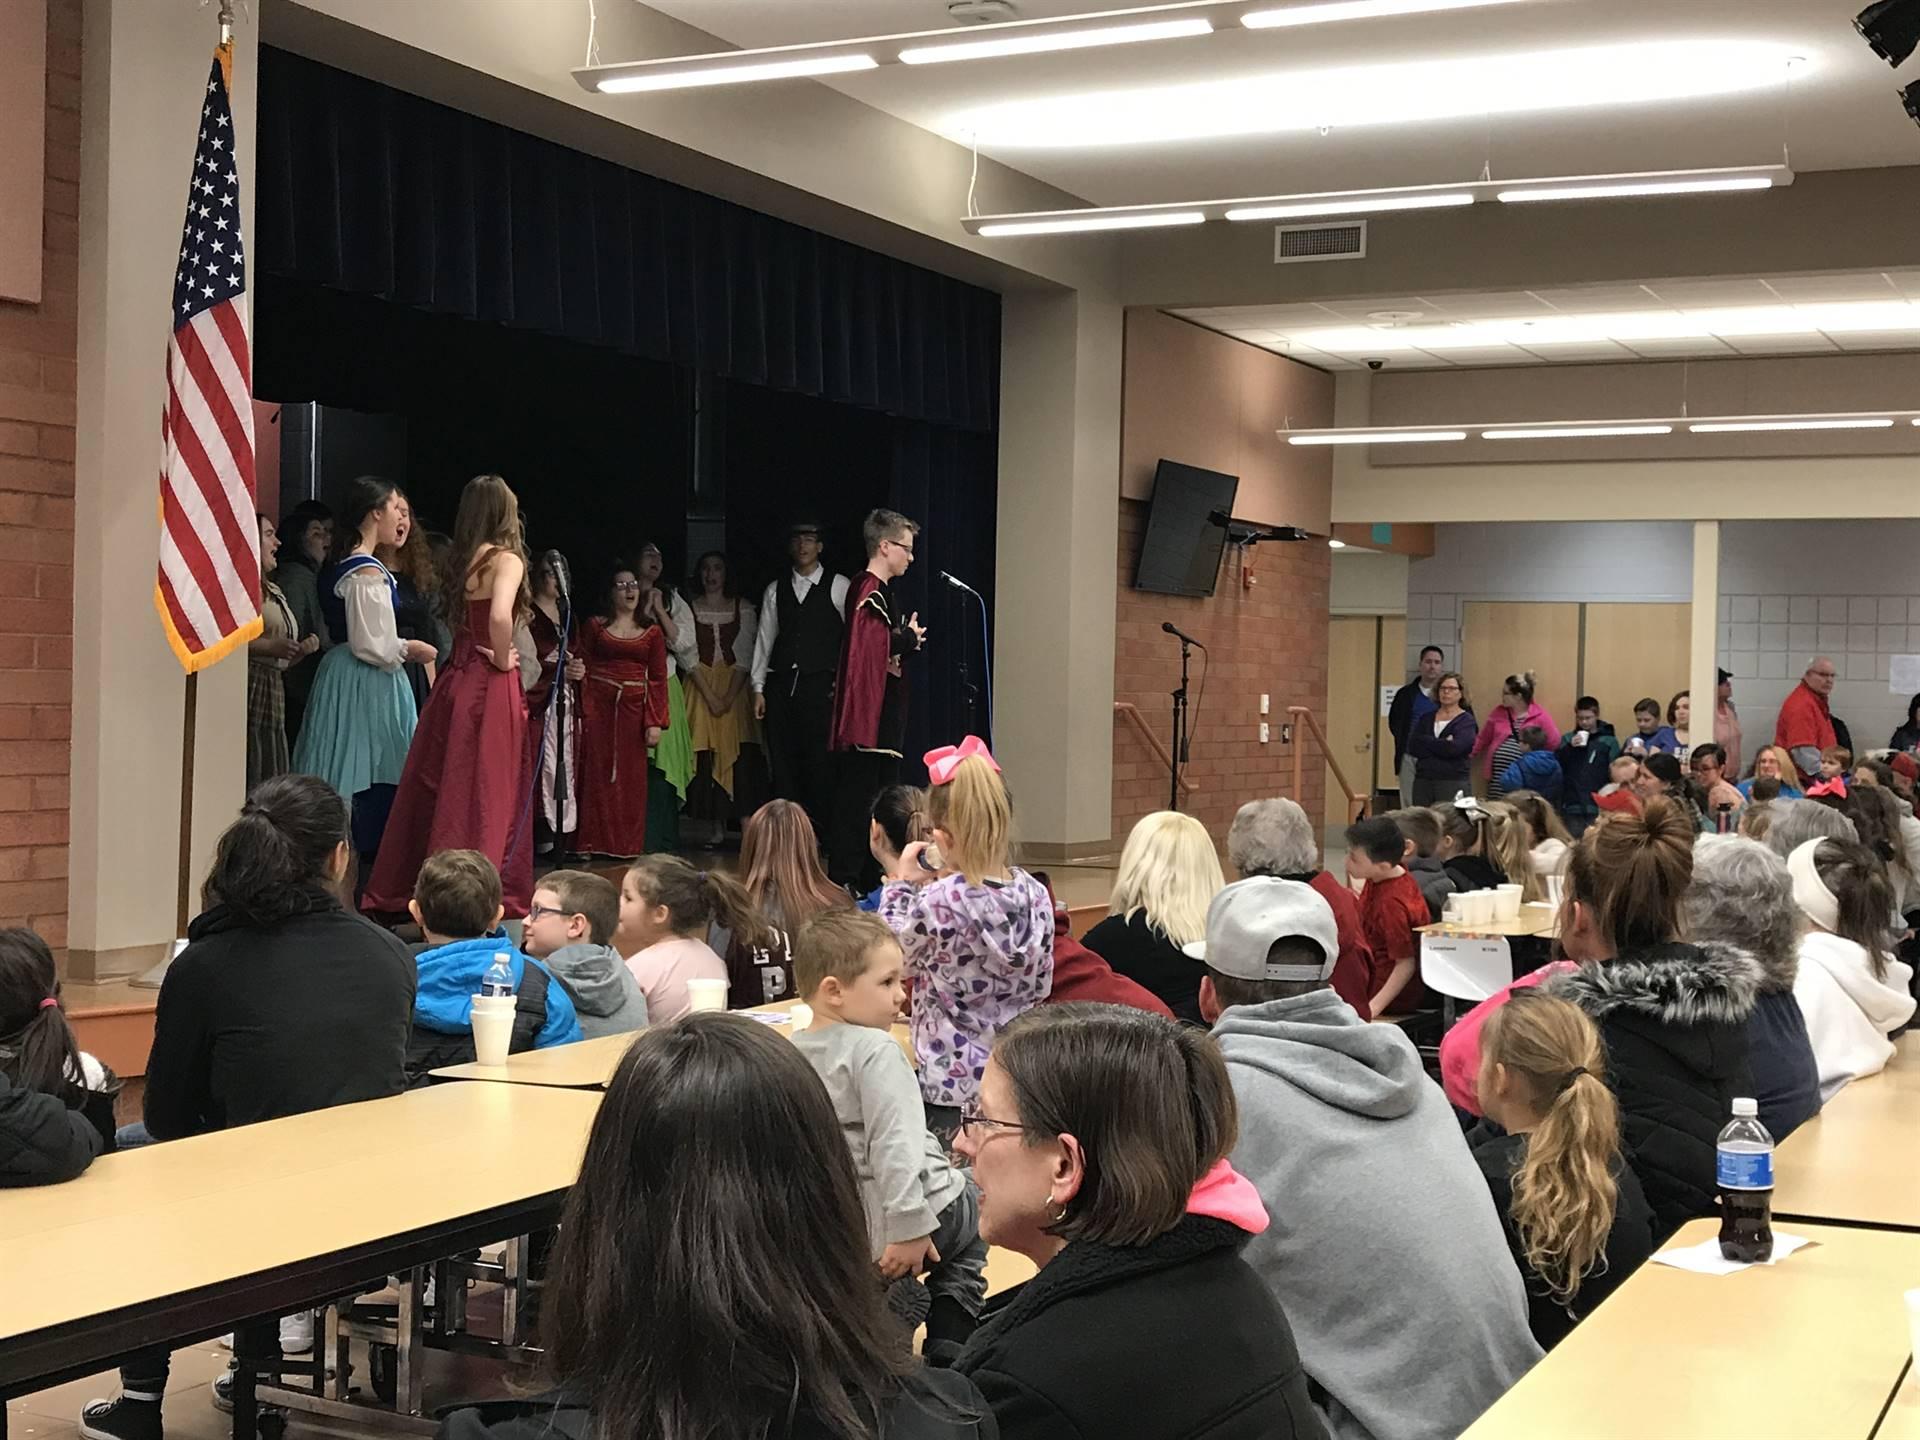 Arts Night 4.11.18 Niles High School Drama Club sneak peek